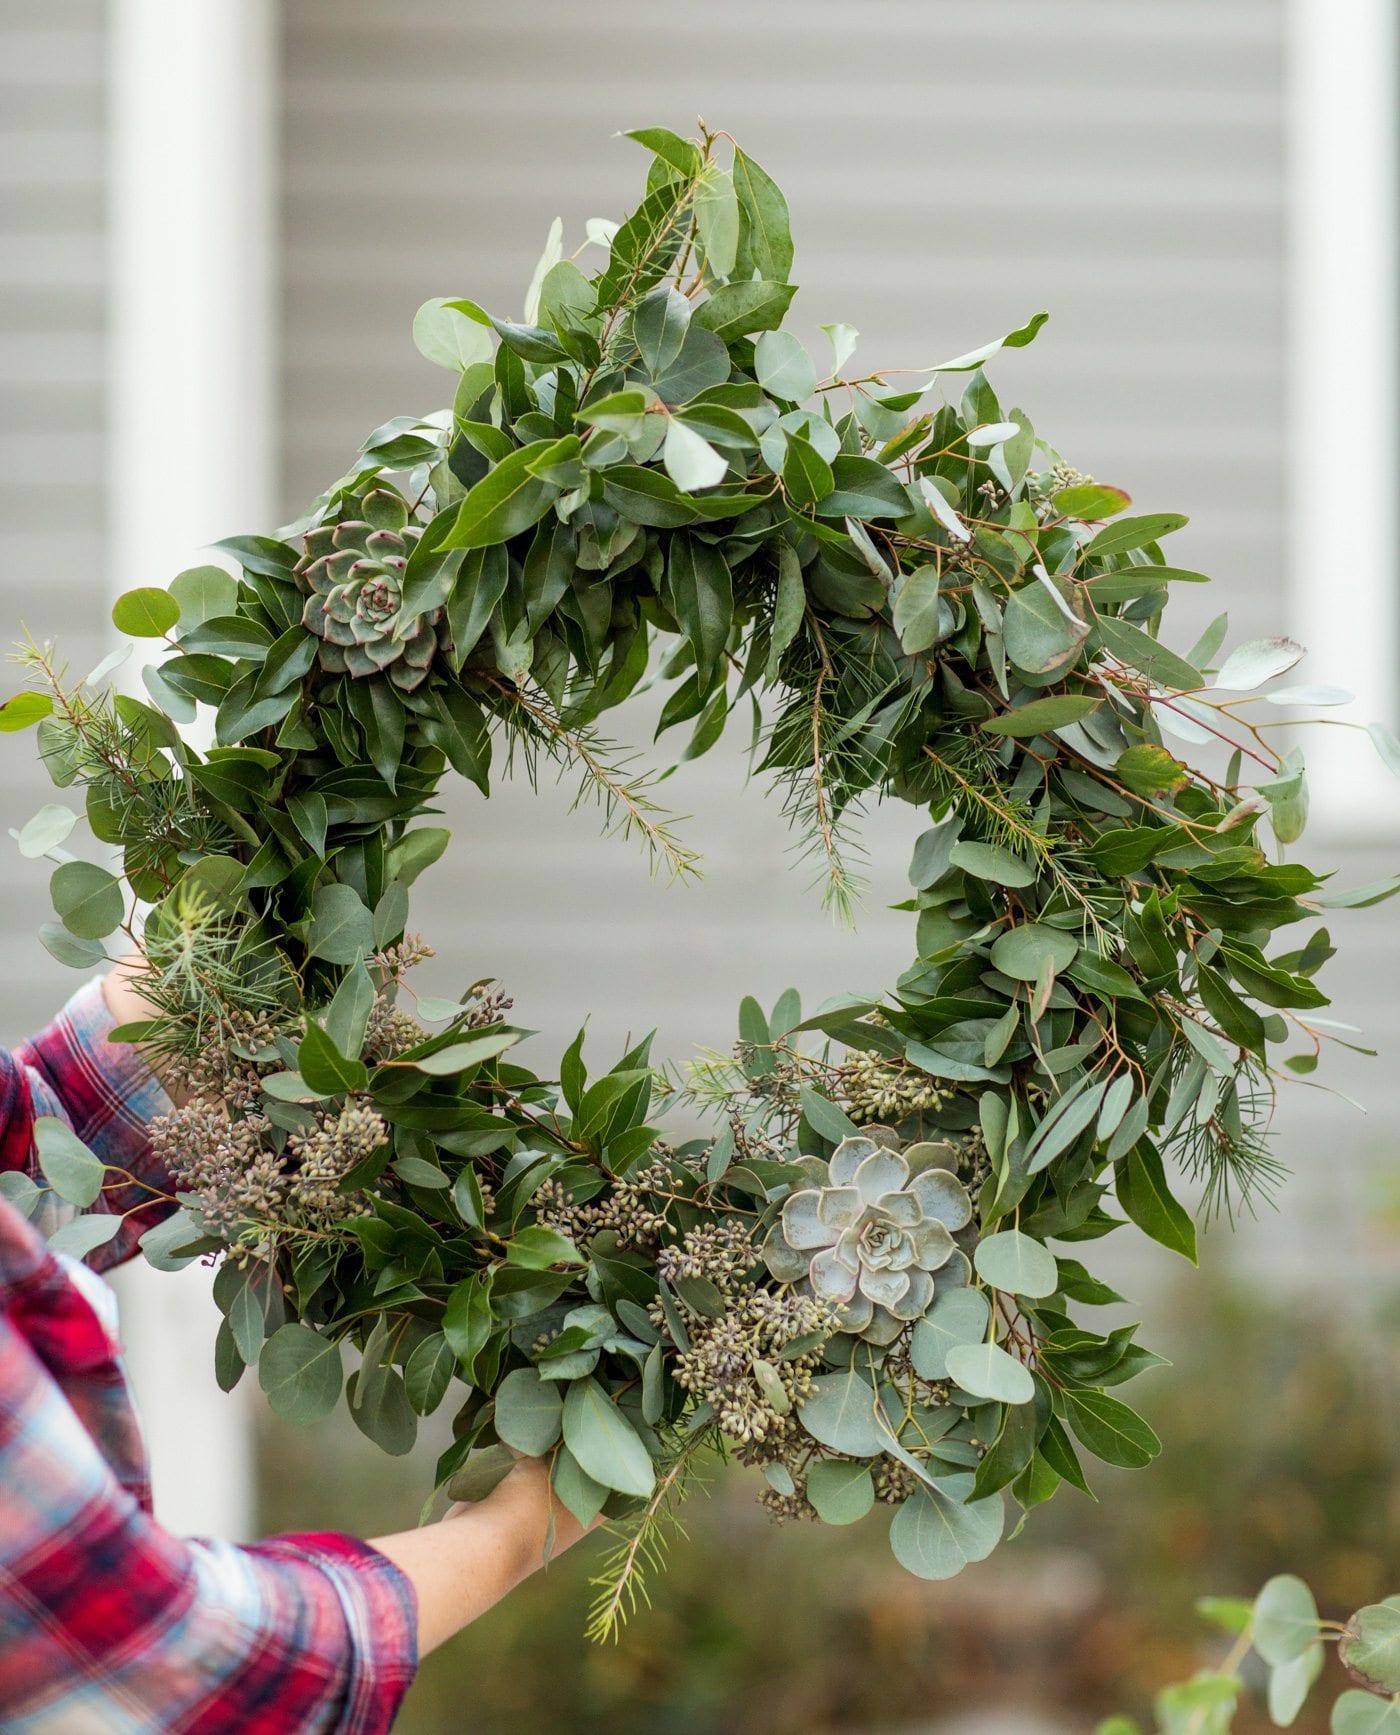 DIY Eucalyptus + Pine Christmas Wreath